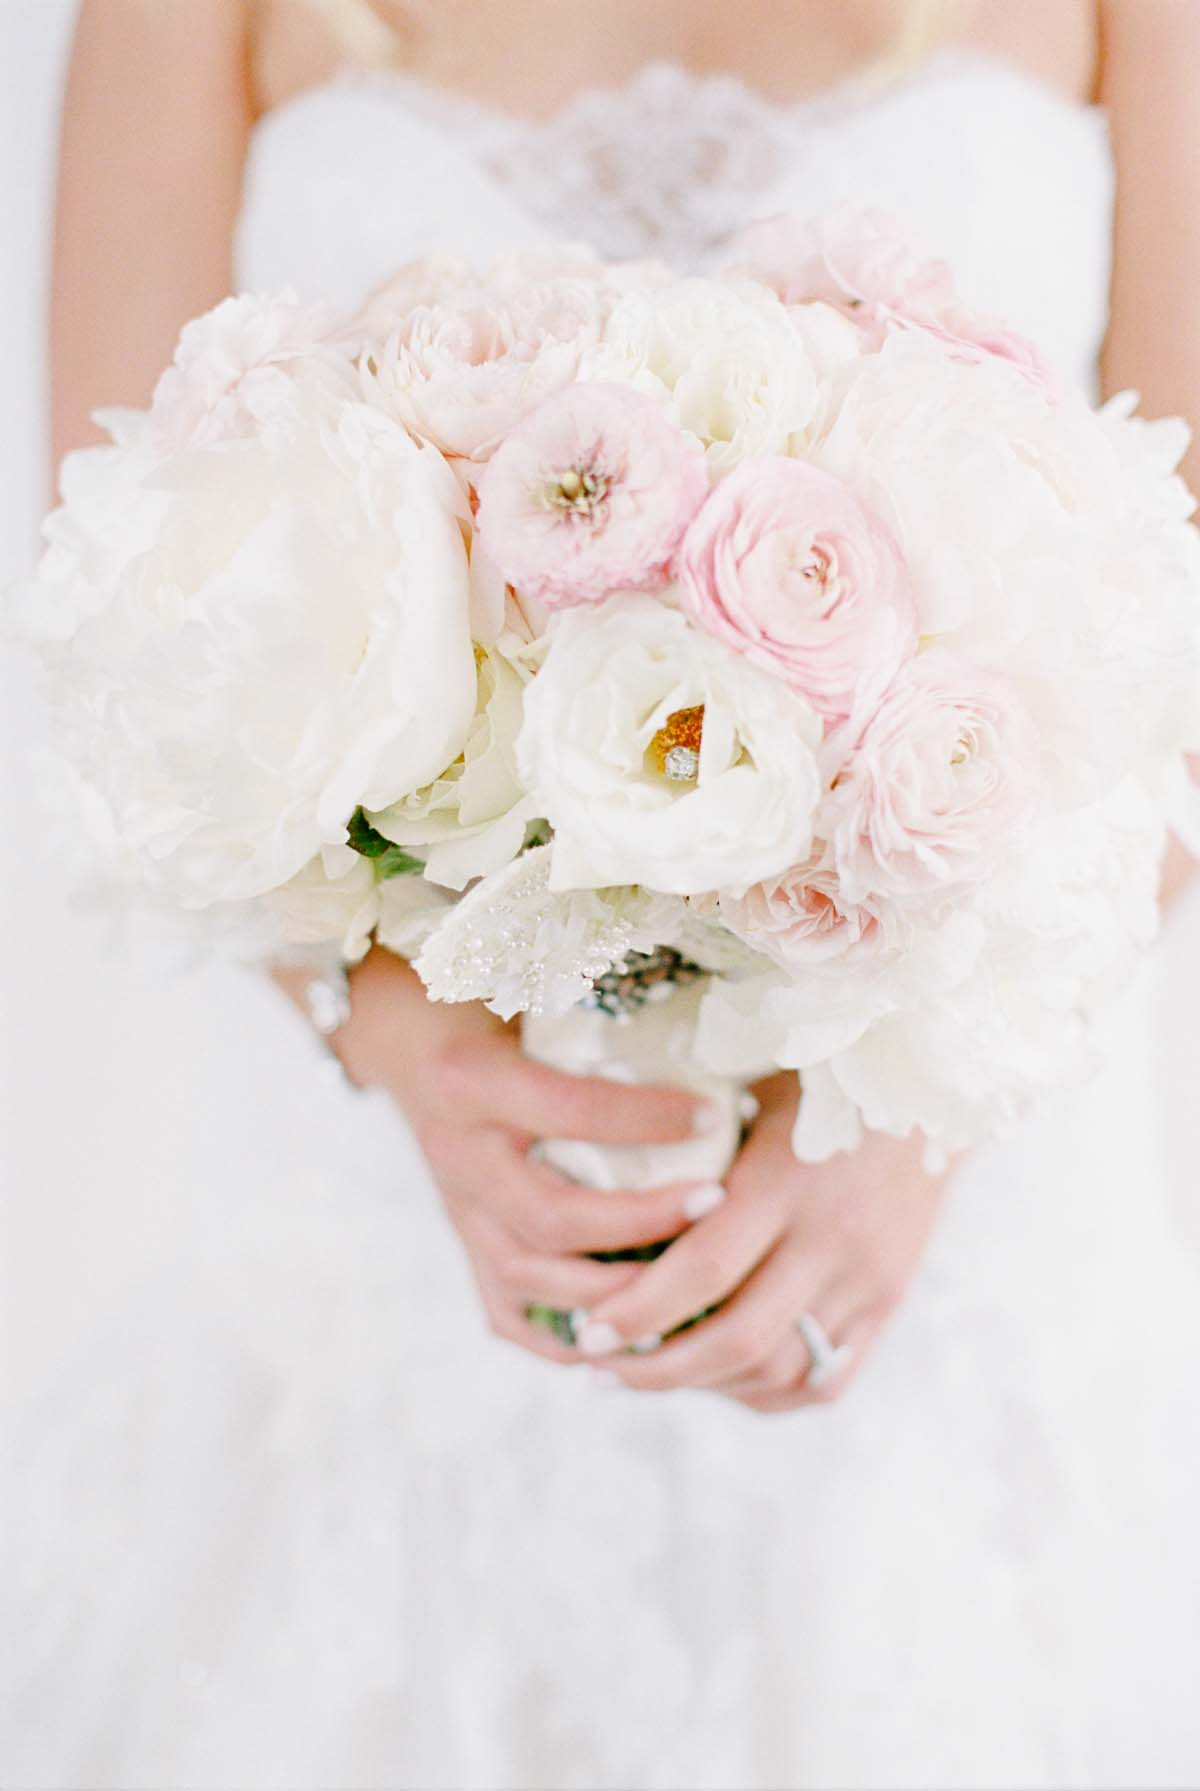 XOXO-BRIDE-Events_Michael-Anna-Costa-Photography-0010